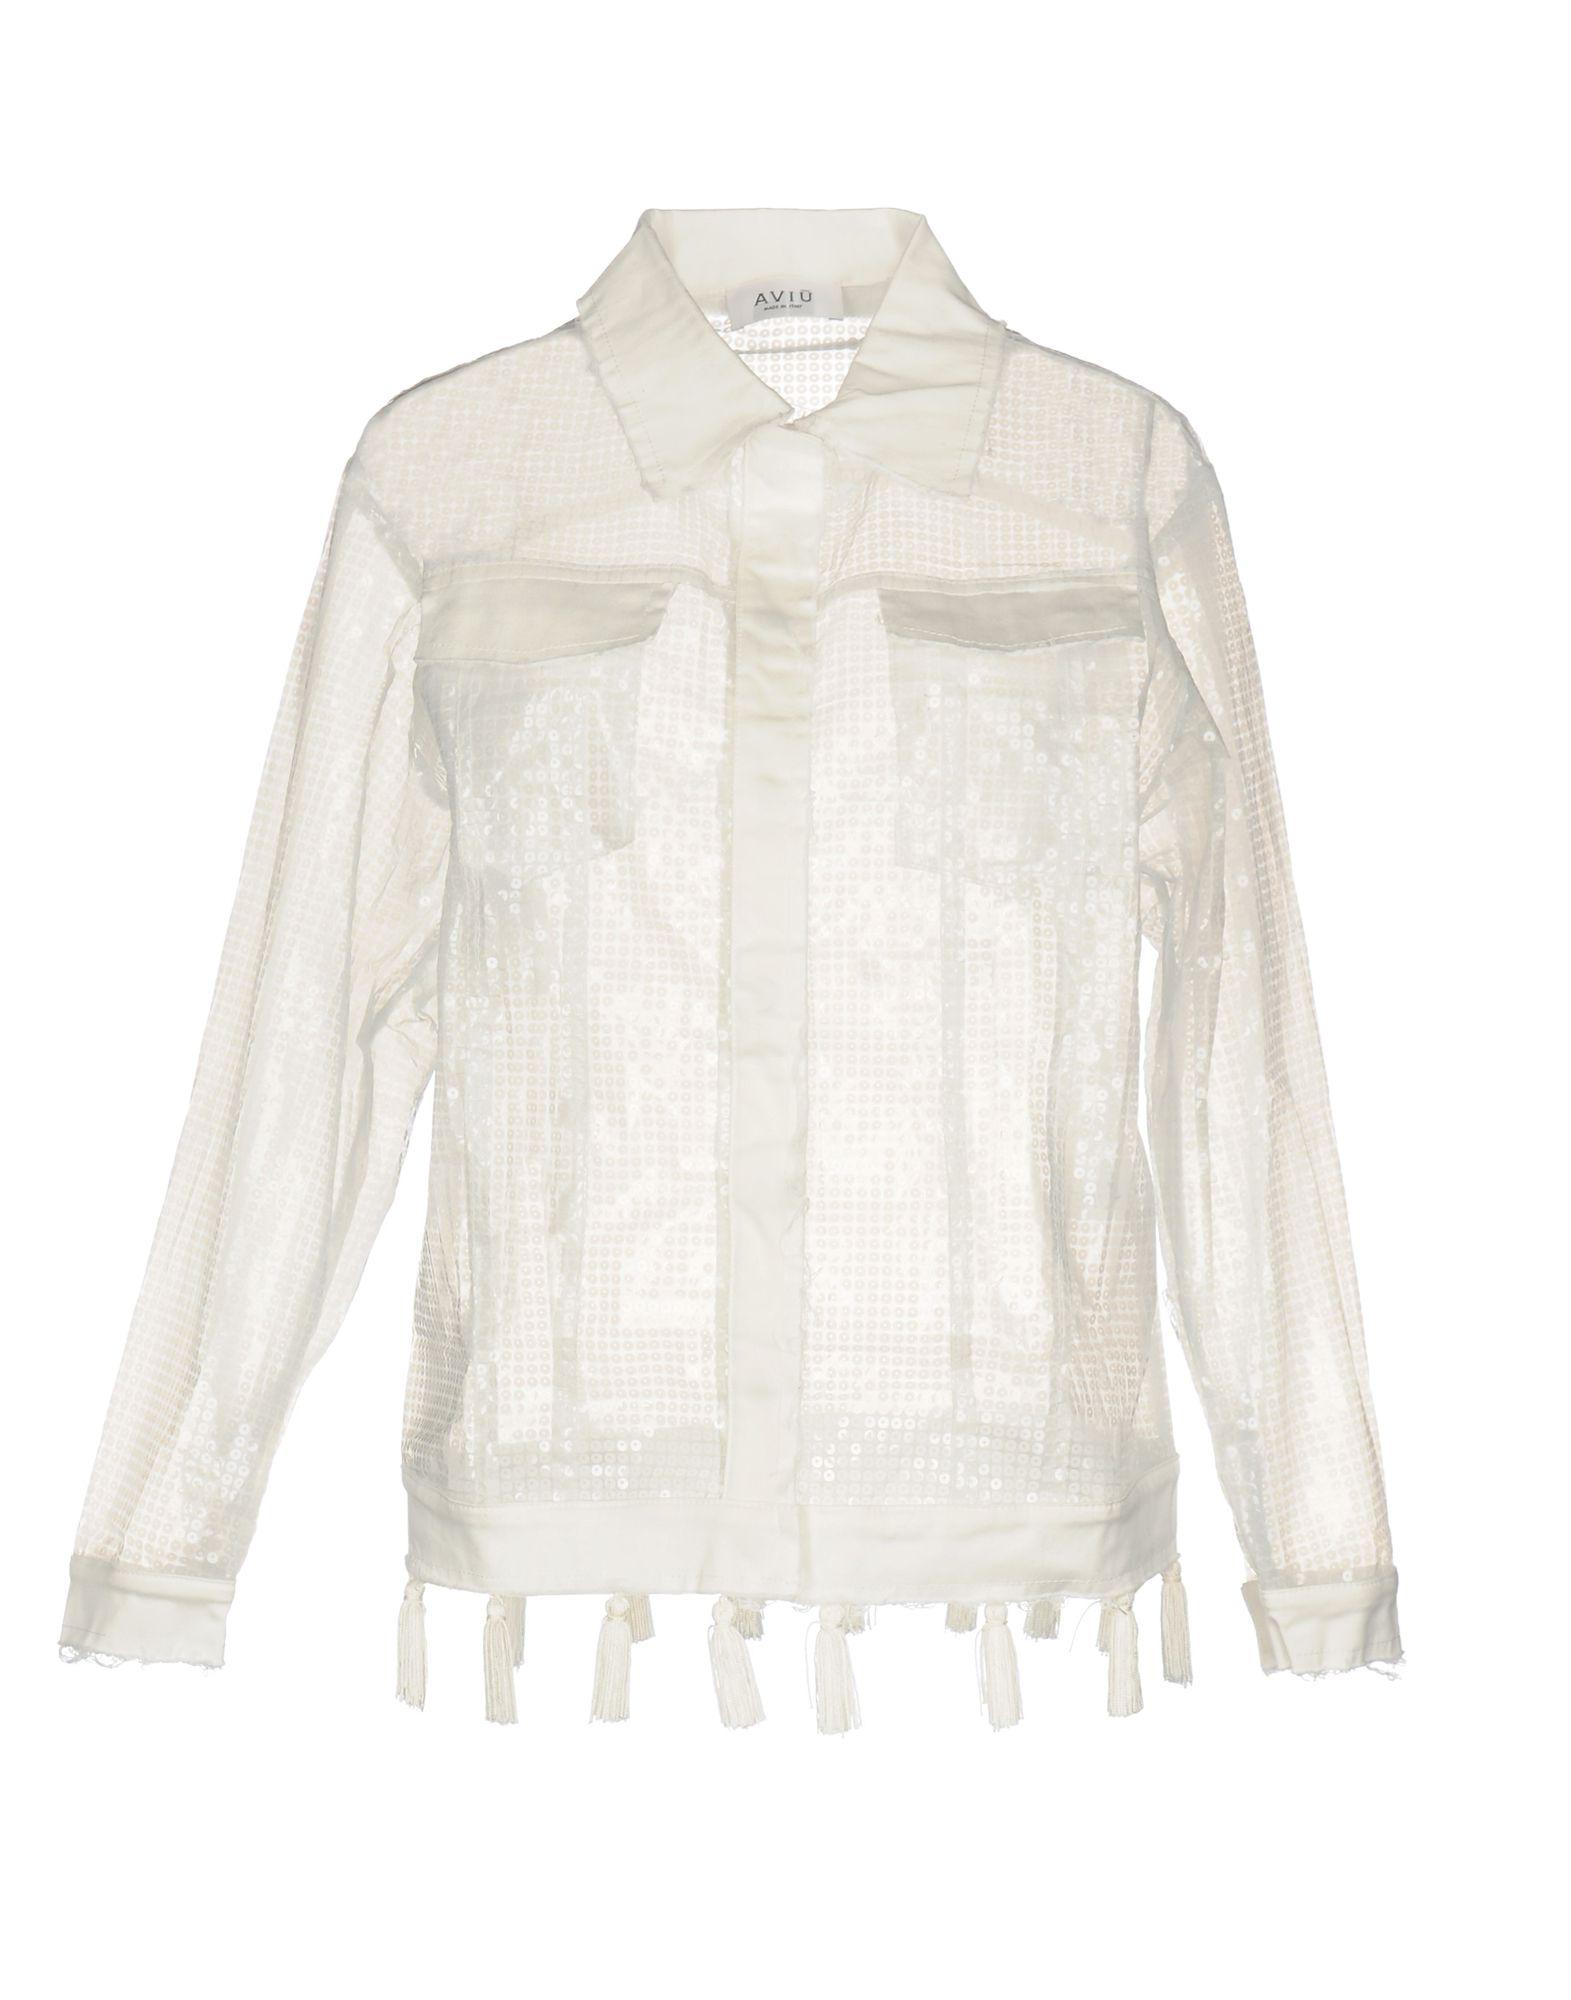 aviù джинсовая верхняя одежда AVIÙ Куртка